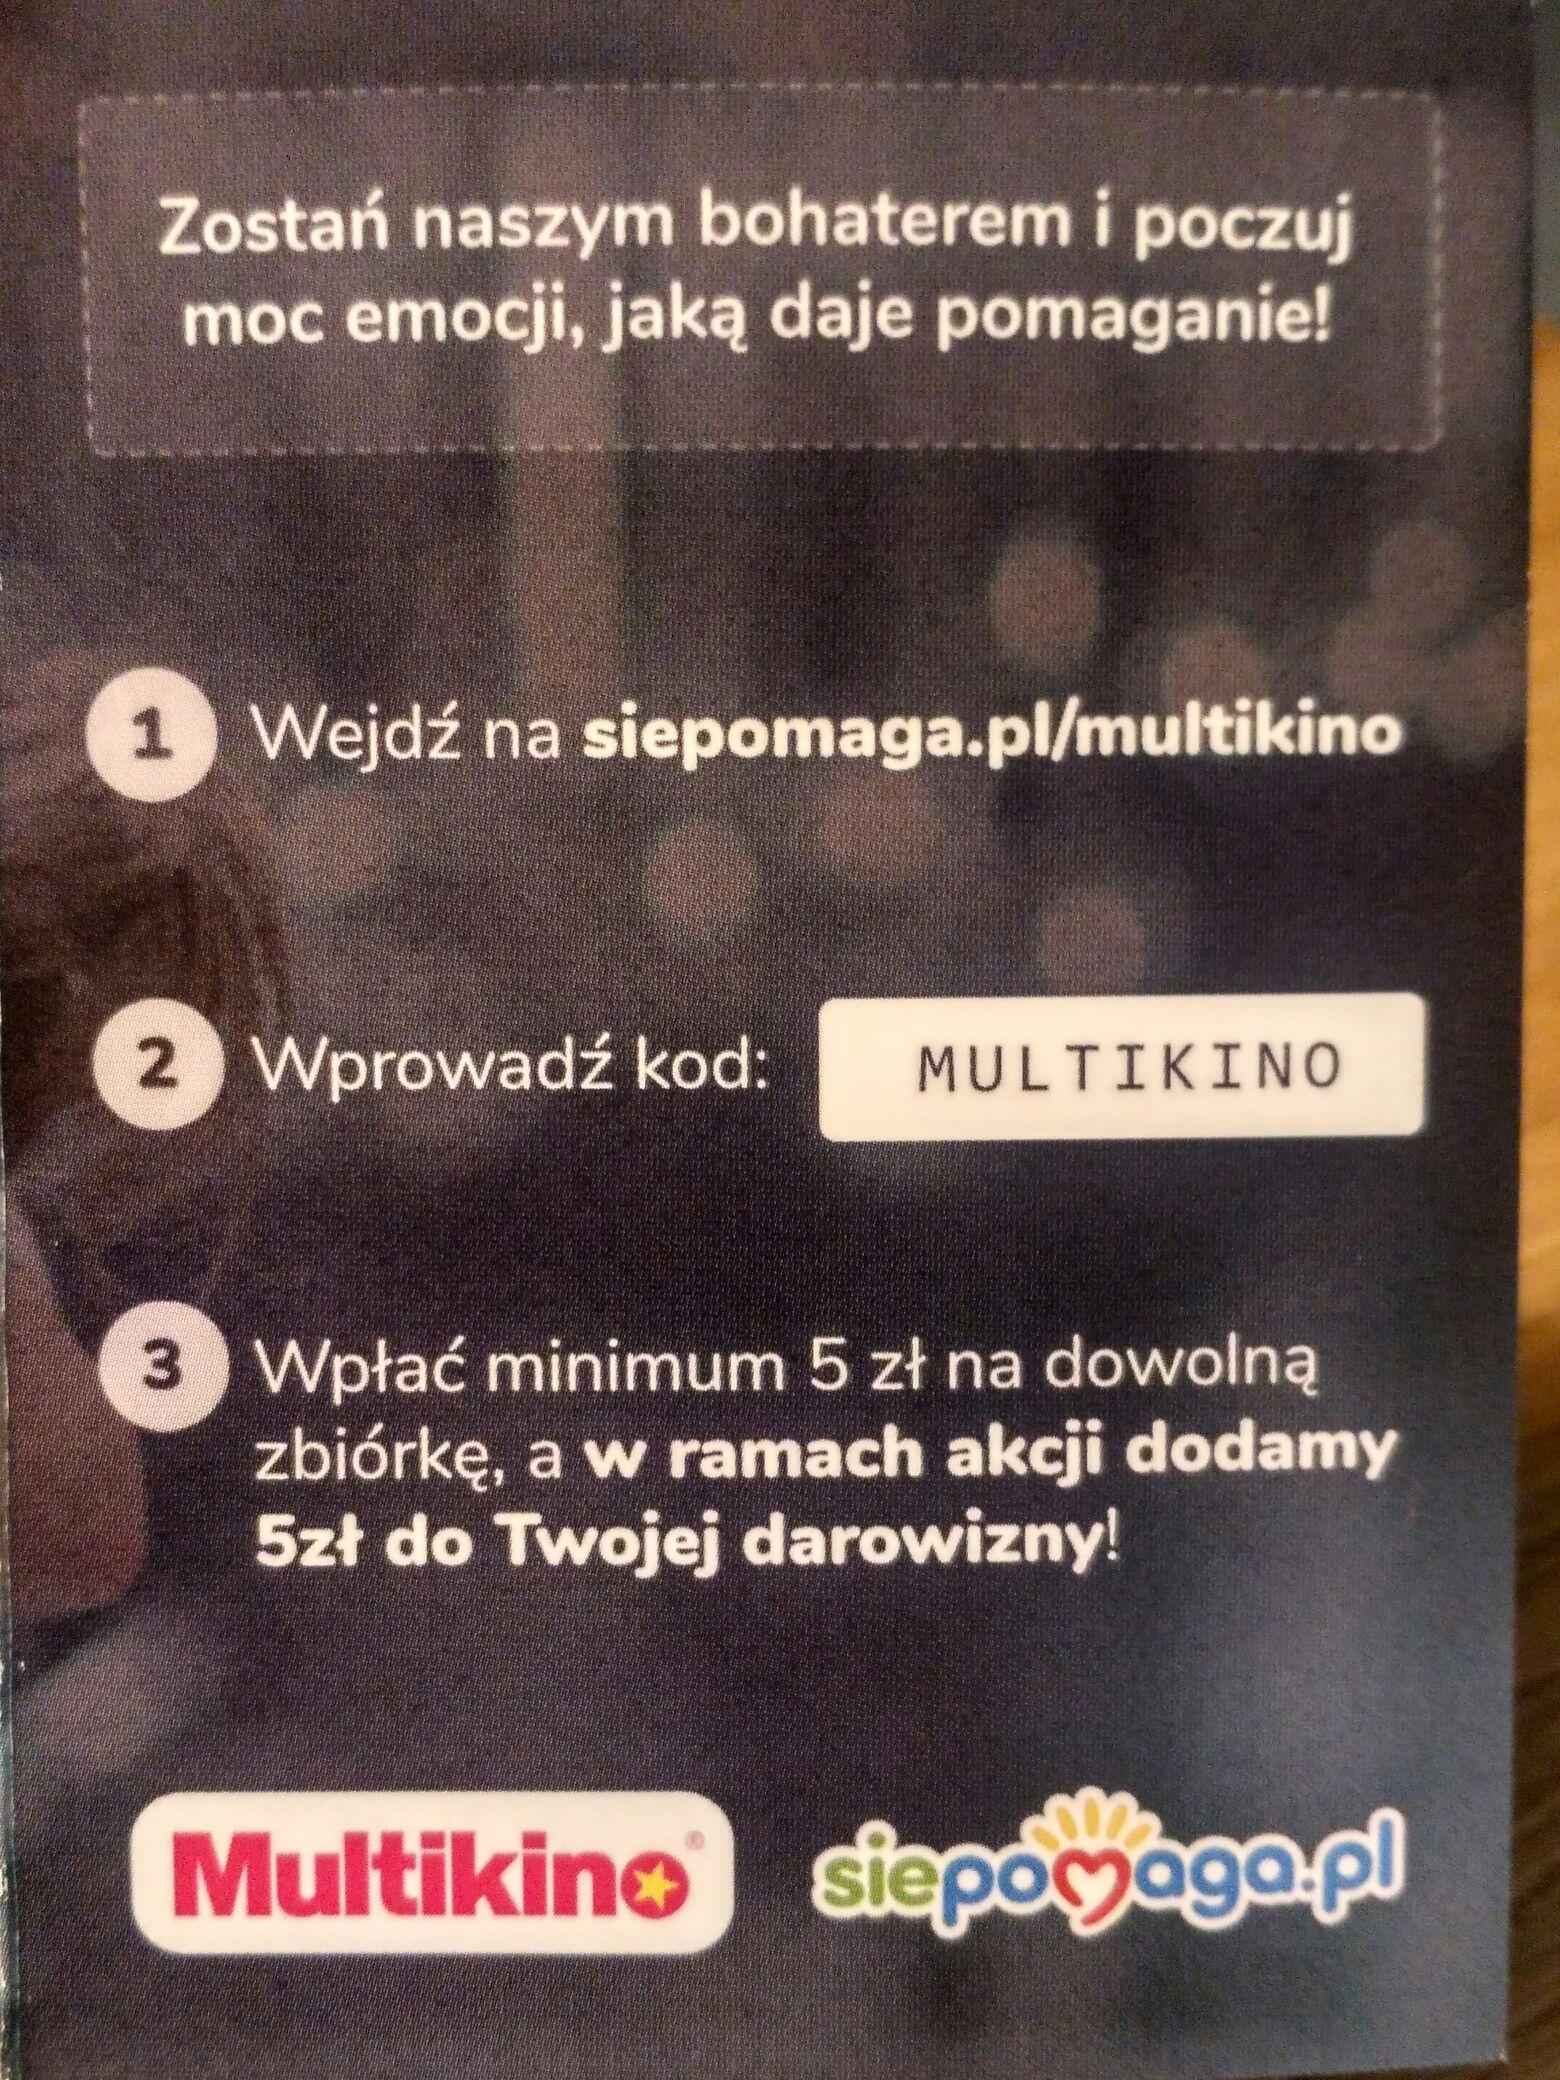 Siepomaga.pl dodatkowe 5 zł od Multikino